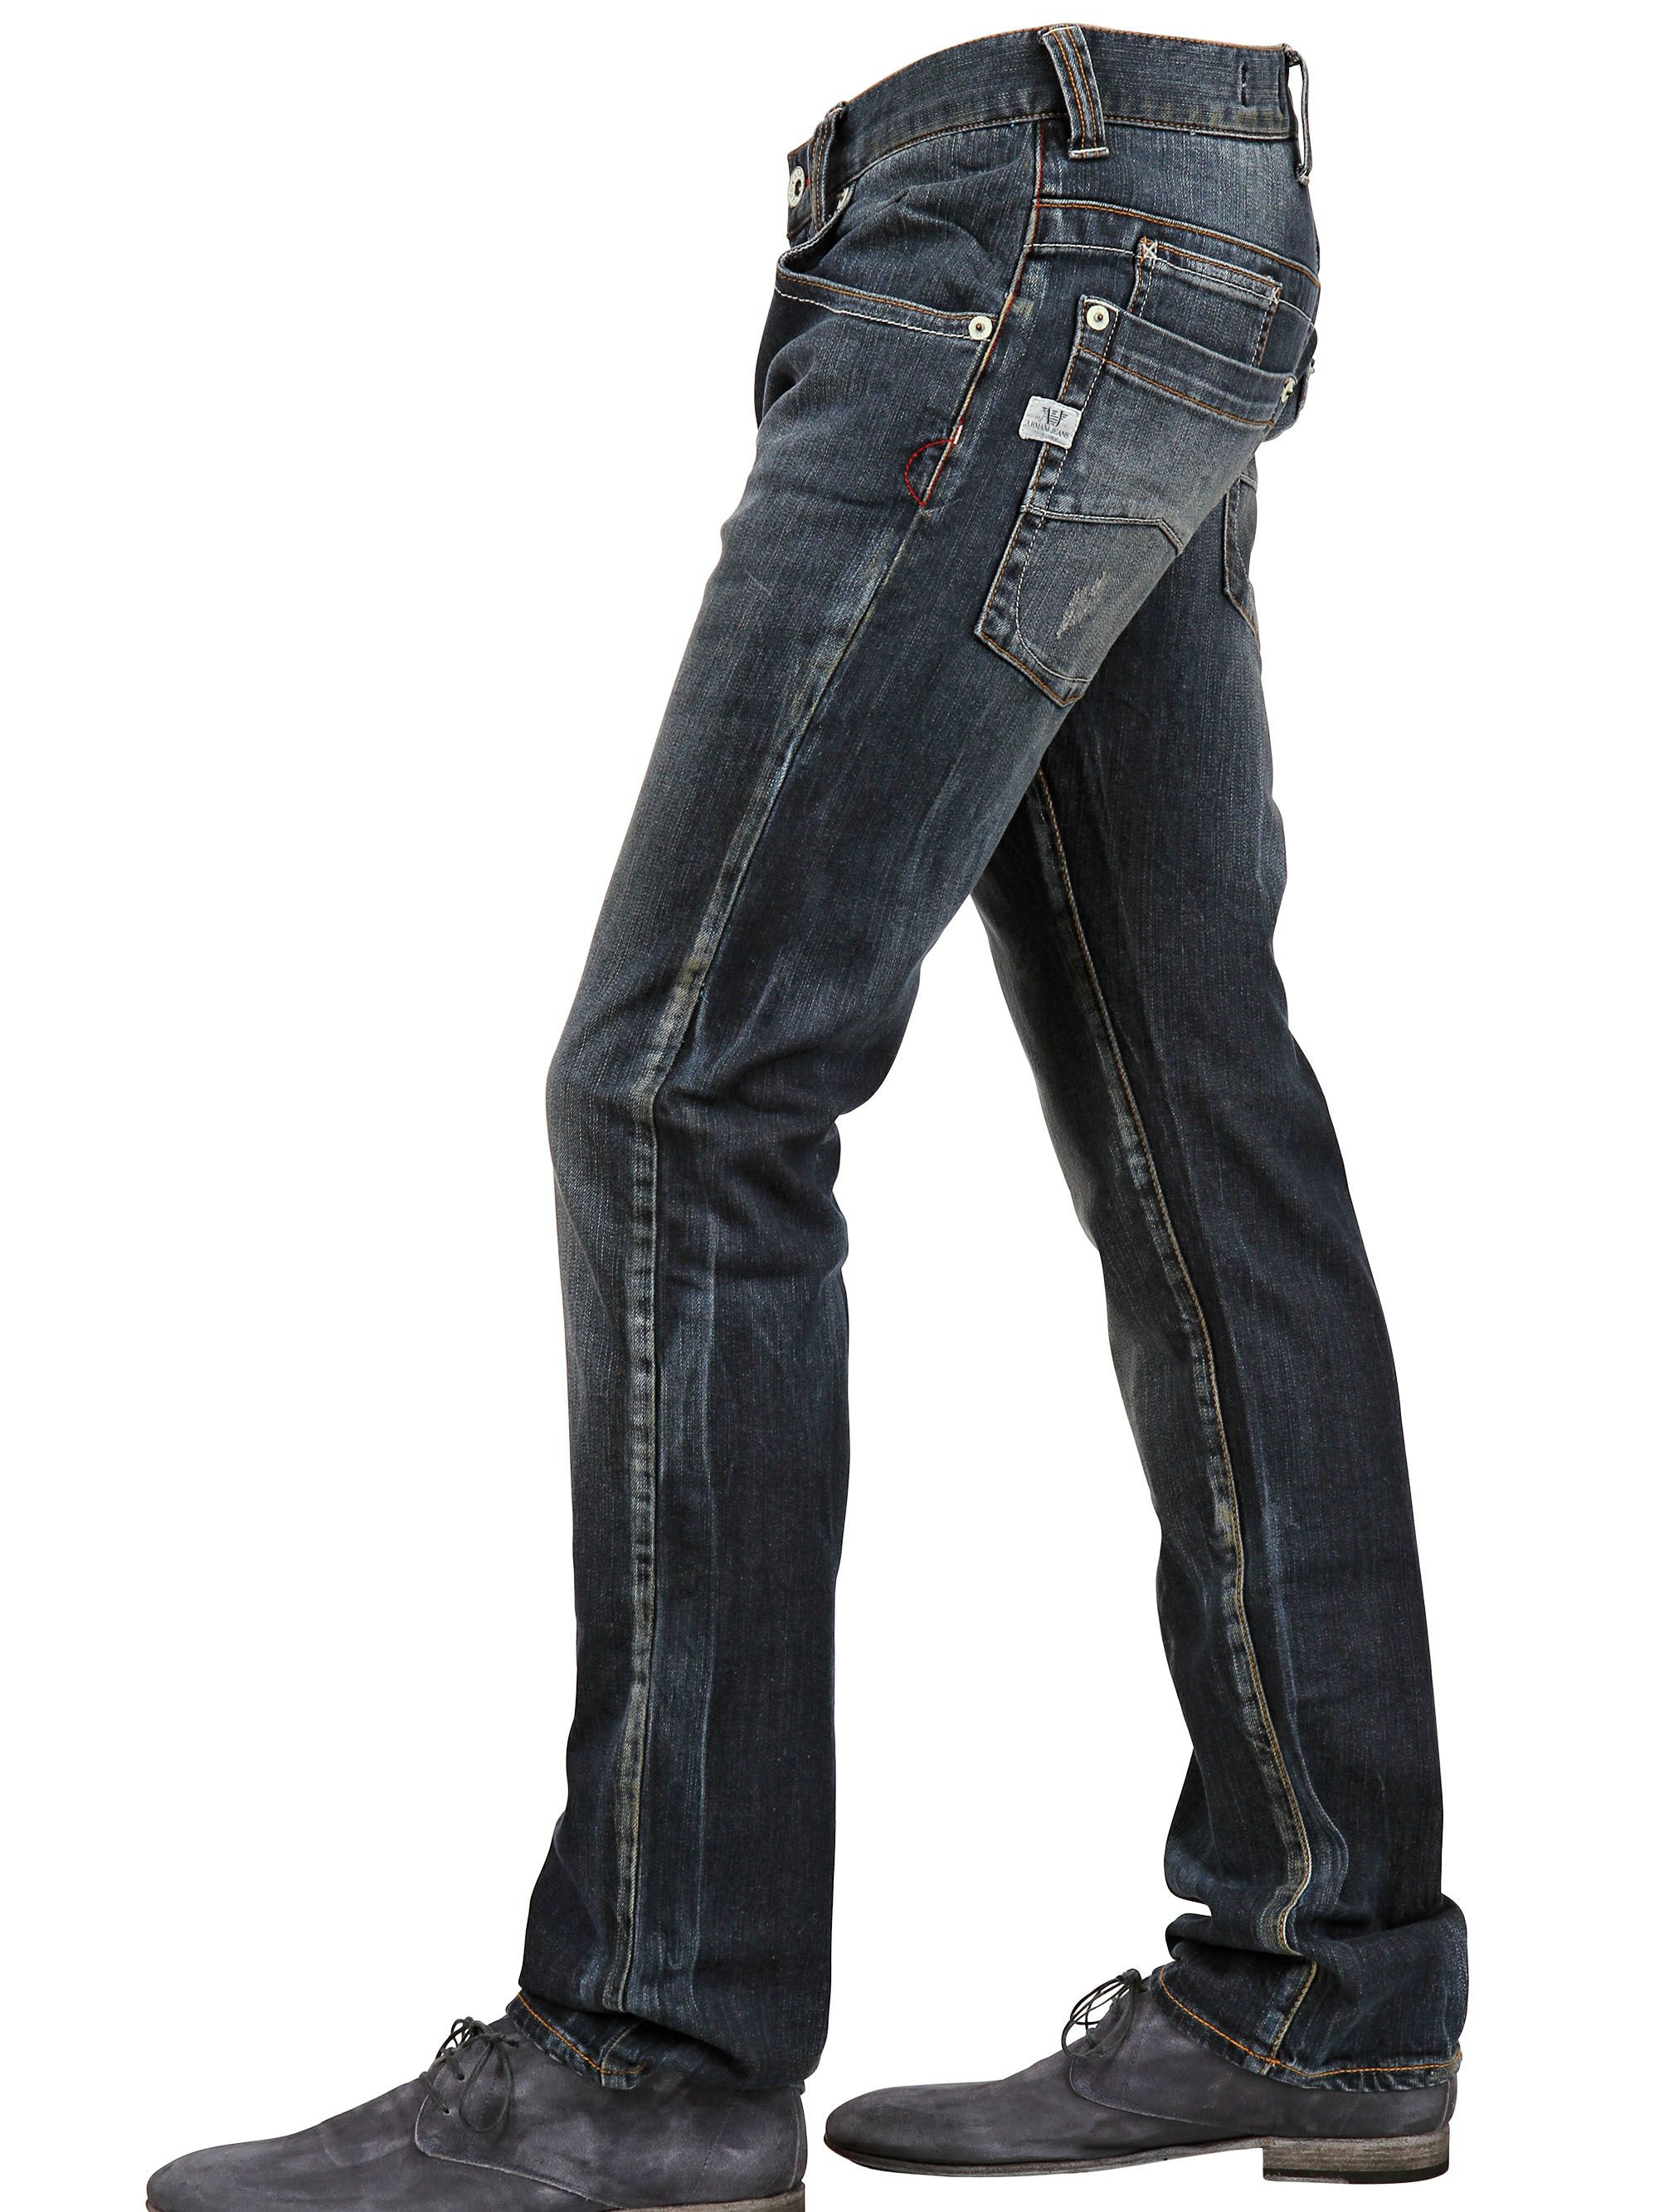 armani jeans 19 5cm low waist stretch denim jeans in blue. Black Bedroom Furniture Sets. Home Design Ideas